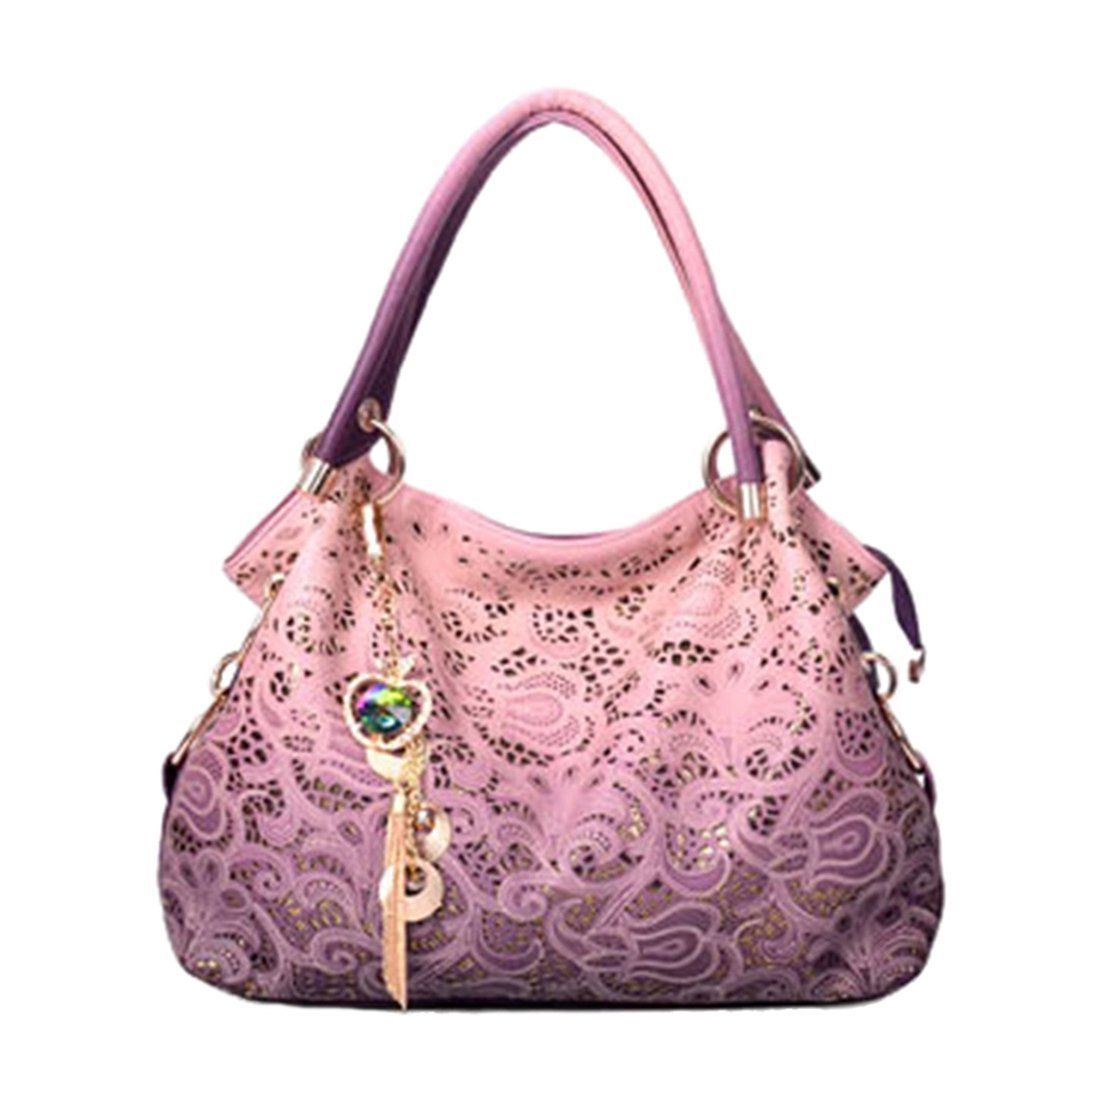 2018 women bag hollow out ombre handbag floral print shoulder bags ladies  pu leather tote bag (Color Pink) Everything Else purses handbags d2f3cc4576580